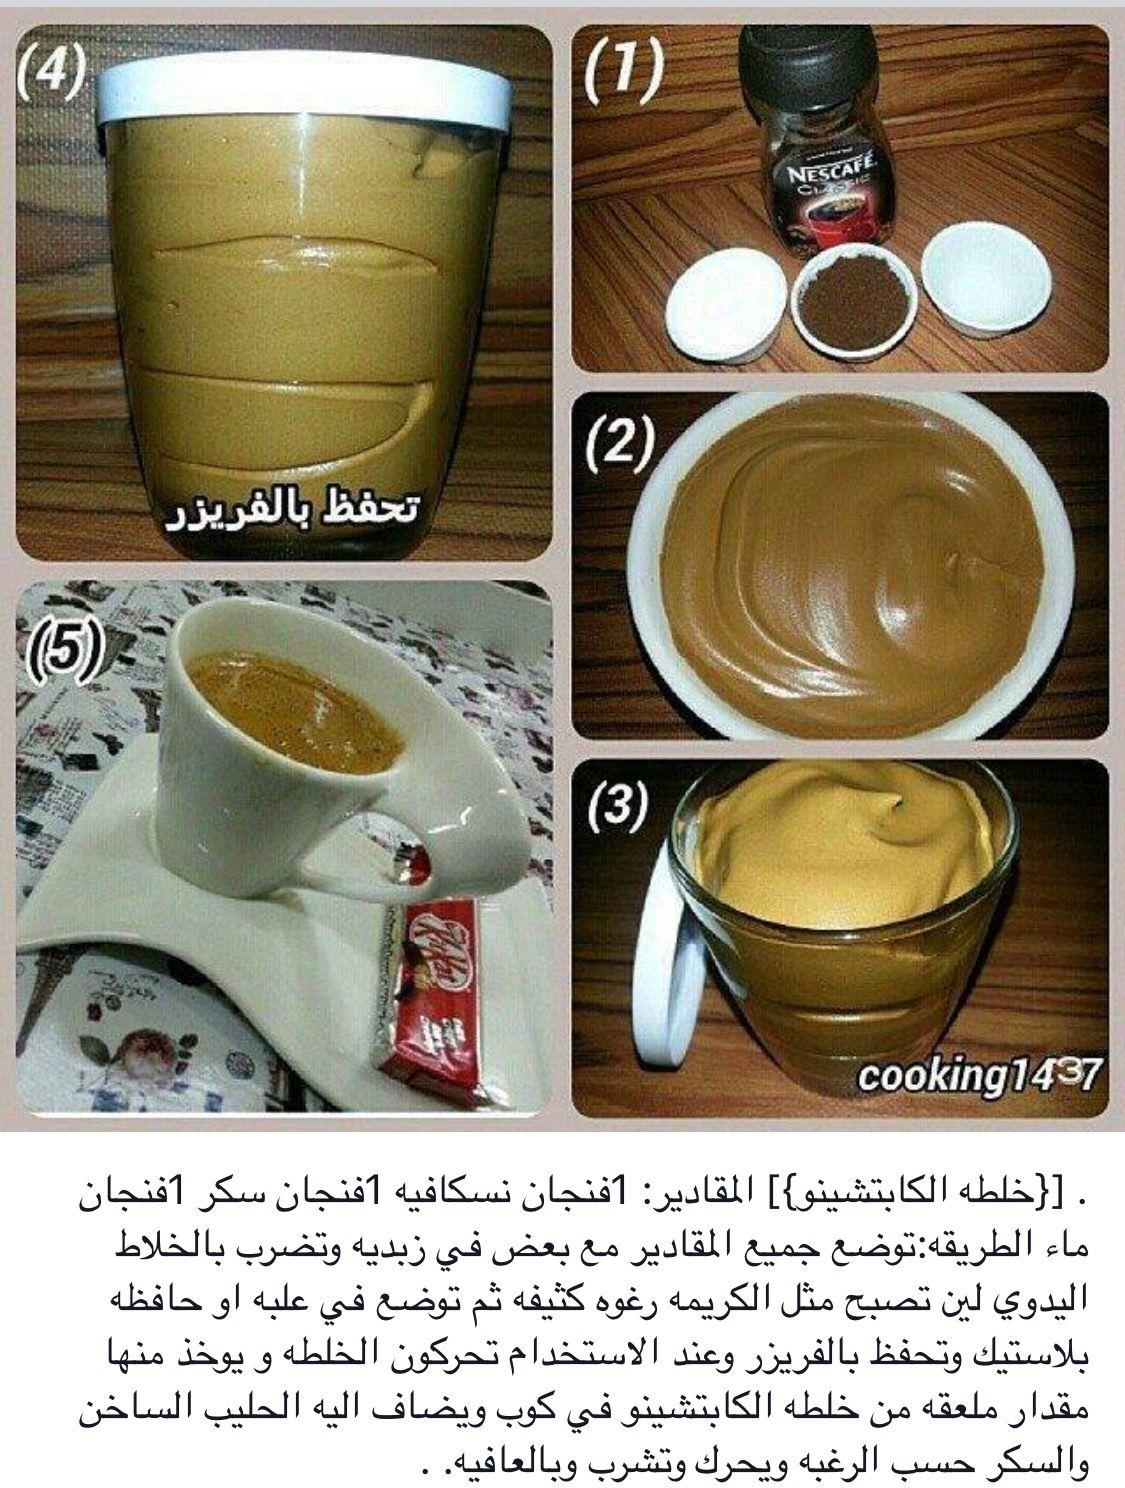 خلطة الكابتشينو Coffee Drink Recipes Coffee Recipes Cookout Food